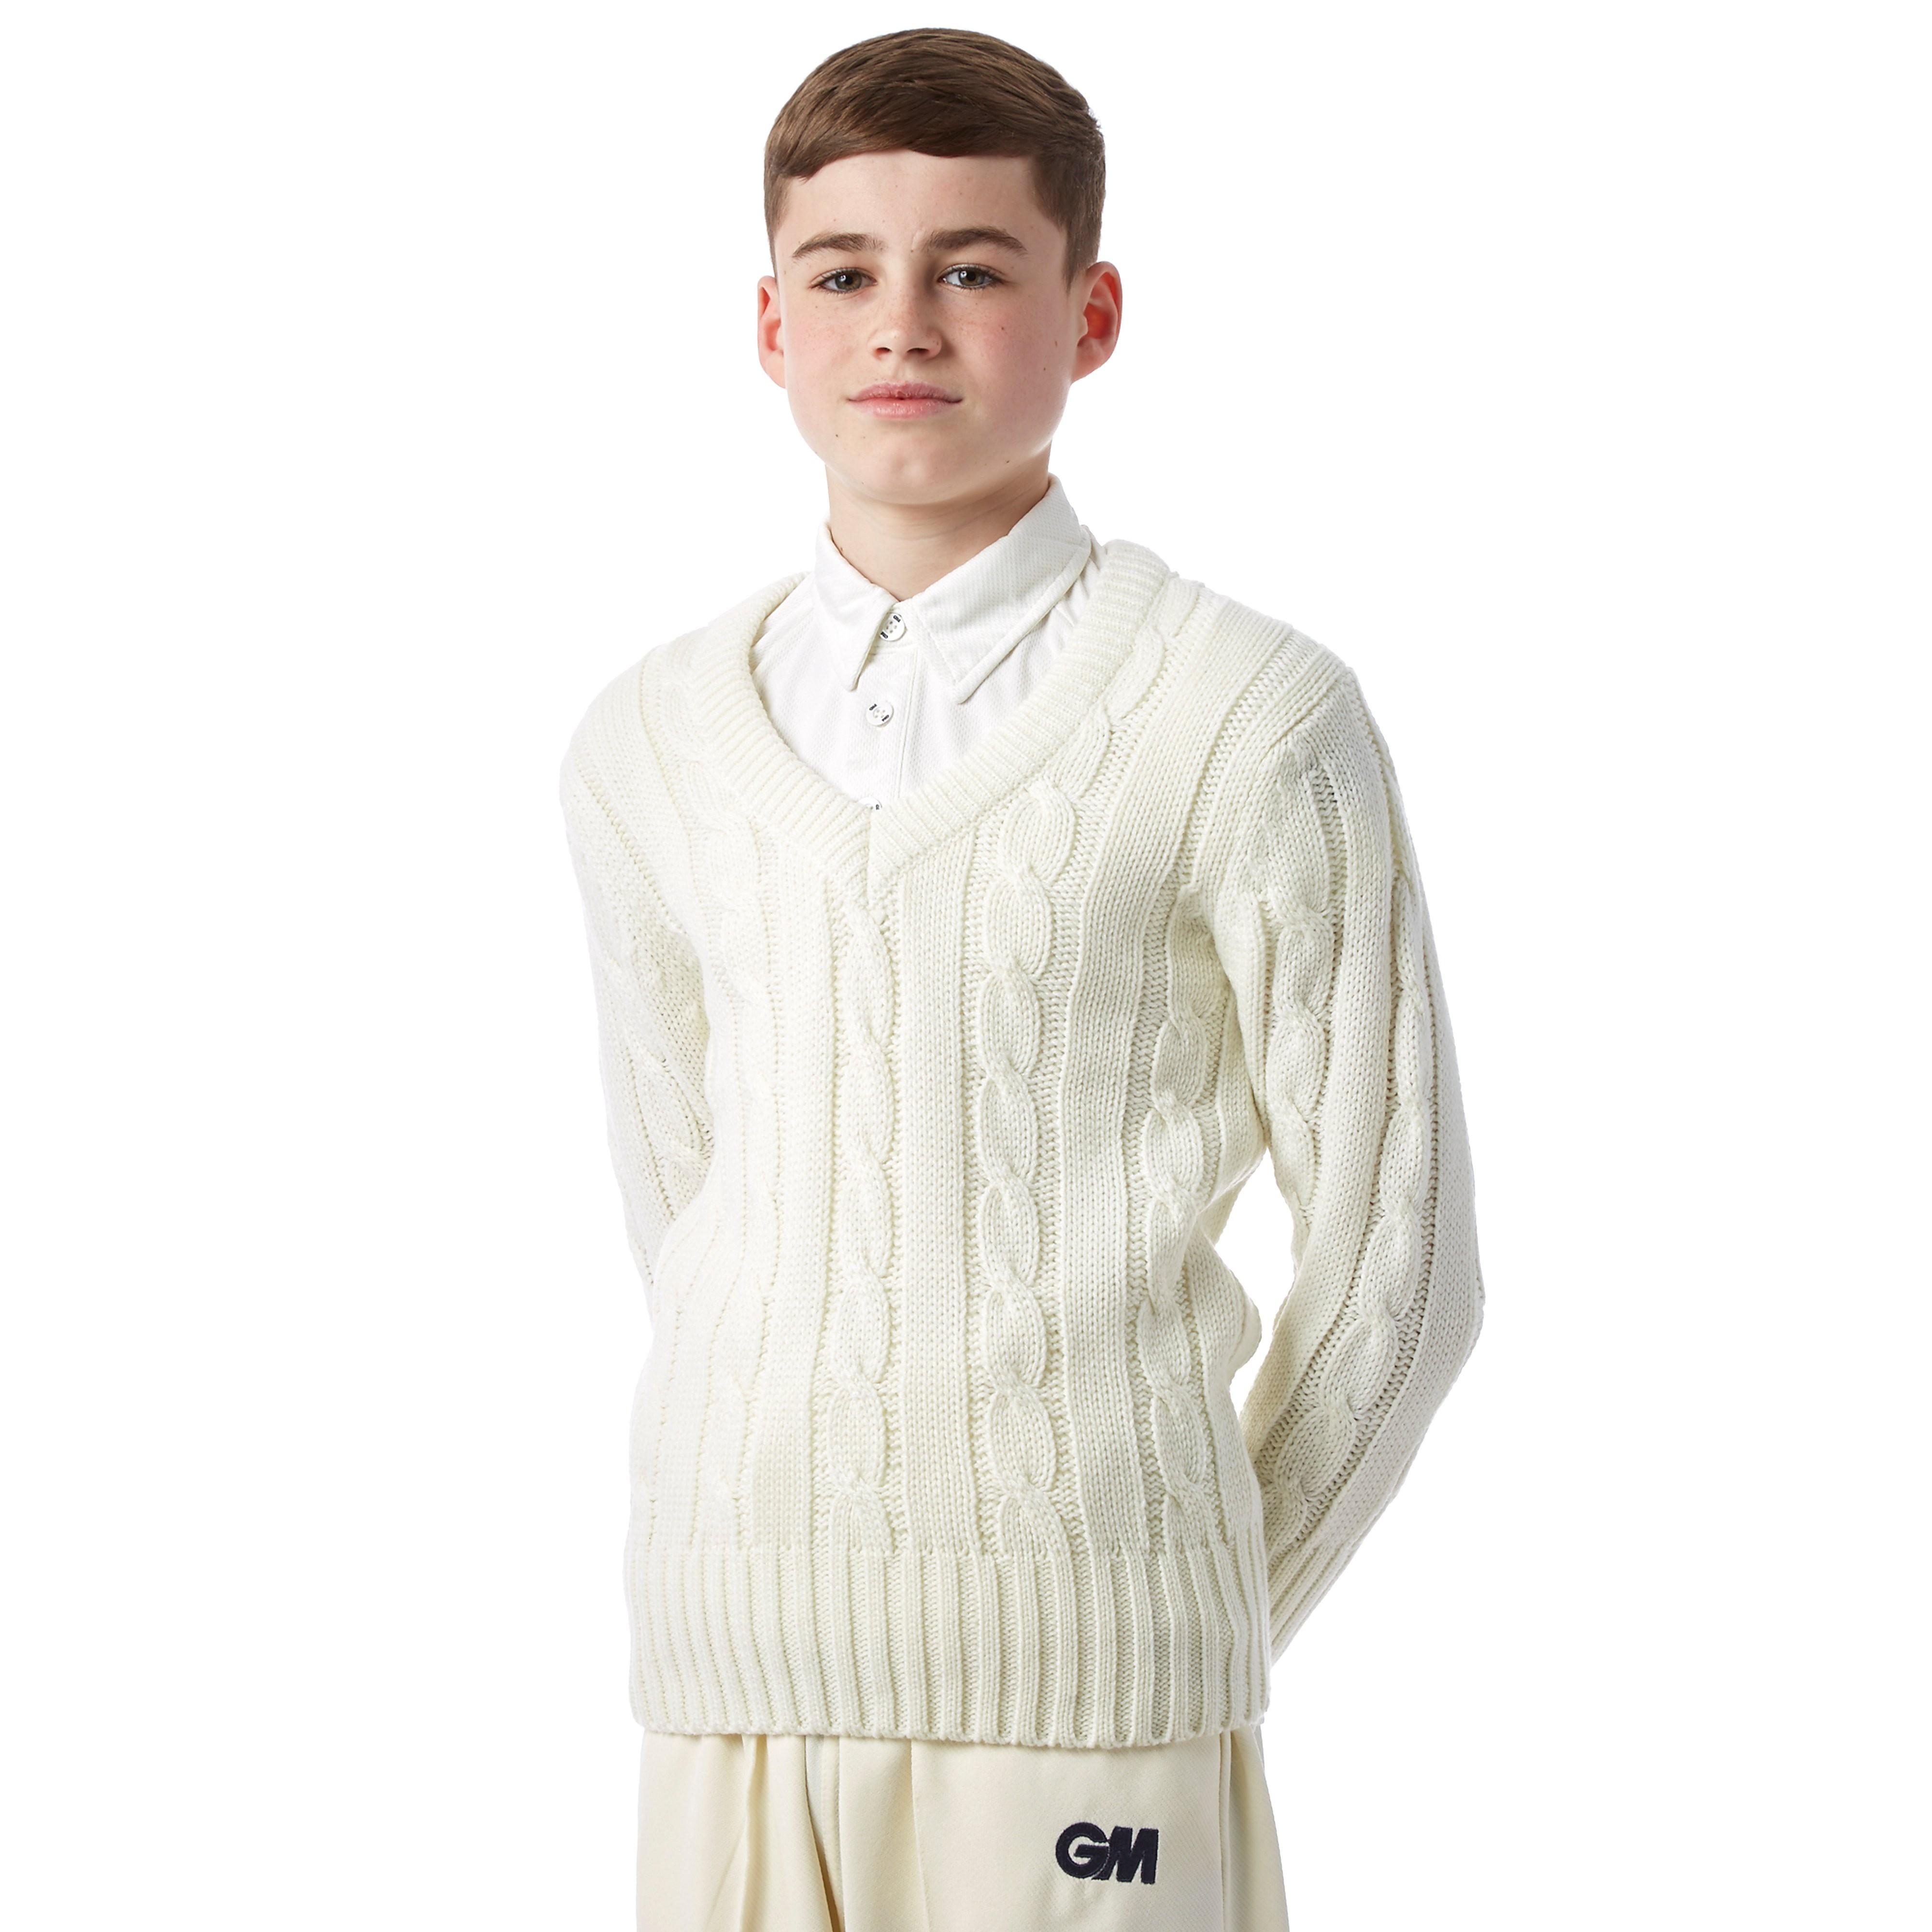 Gunn & Moore Long Sleeved Plain Sweater Junior Cricket Top